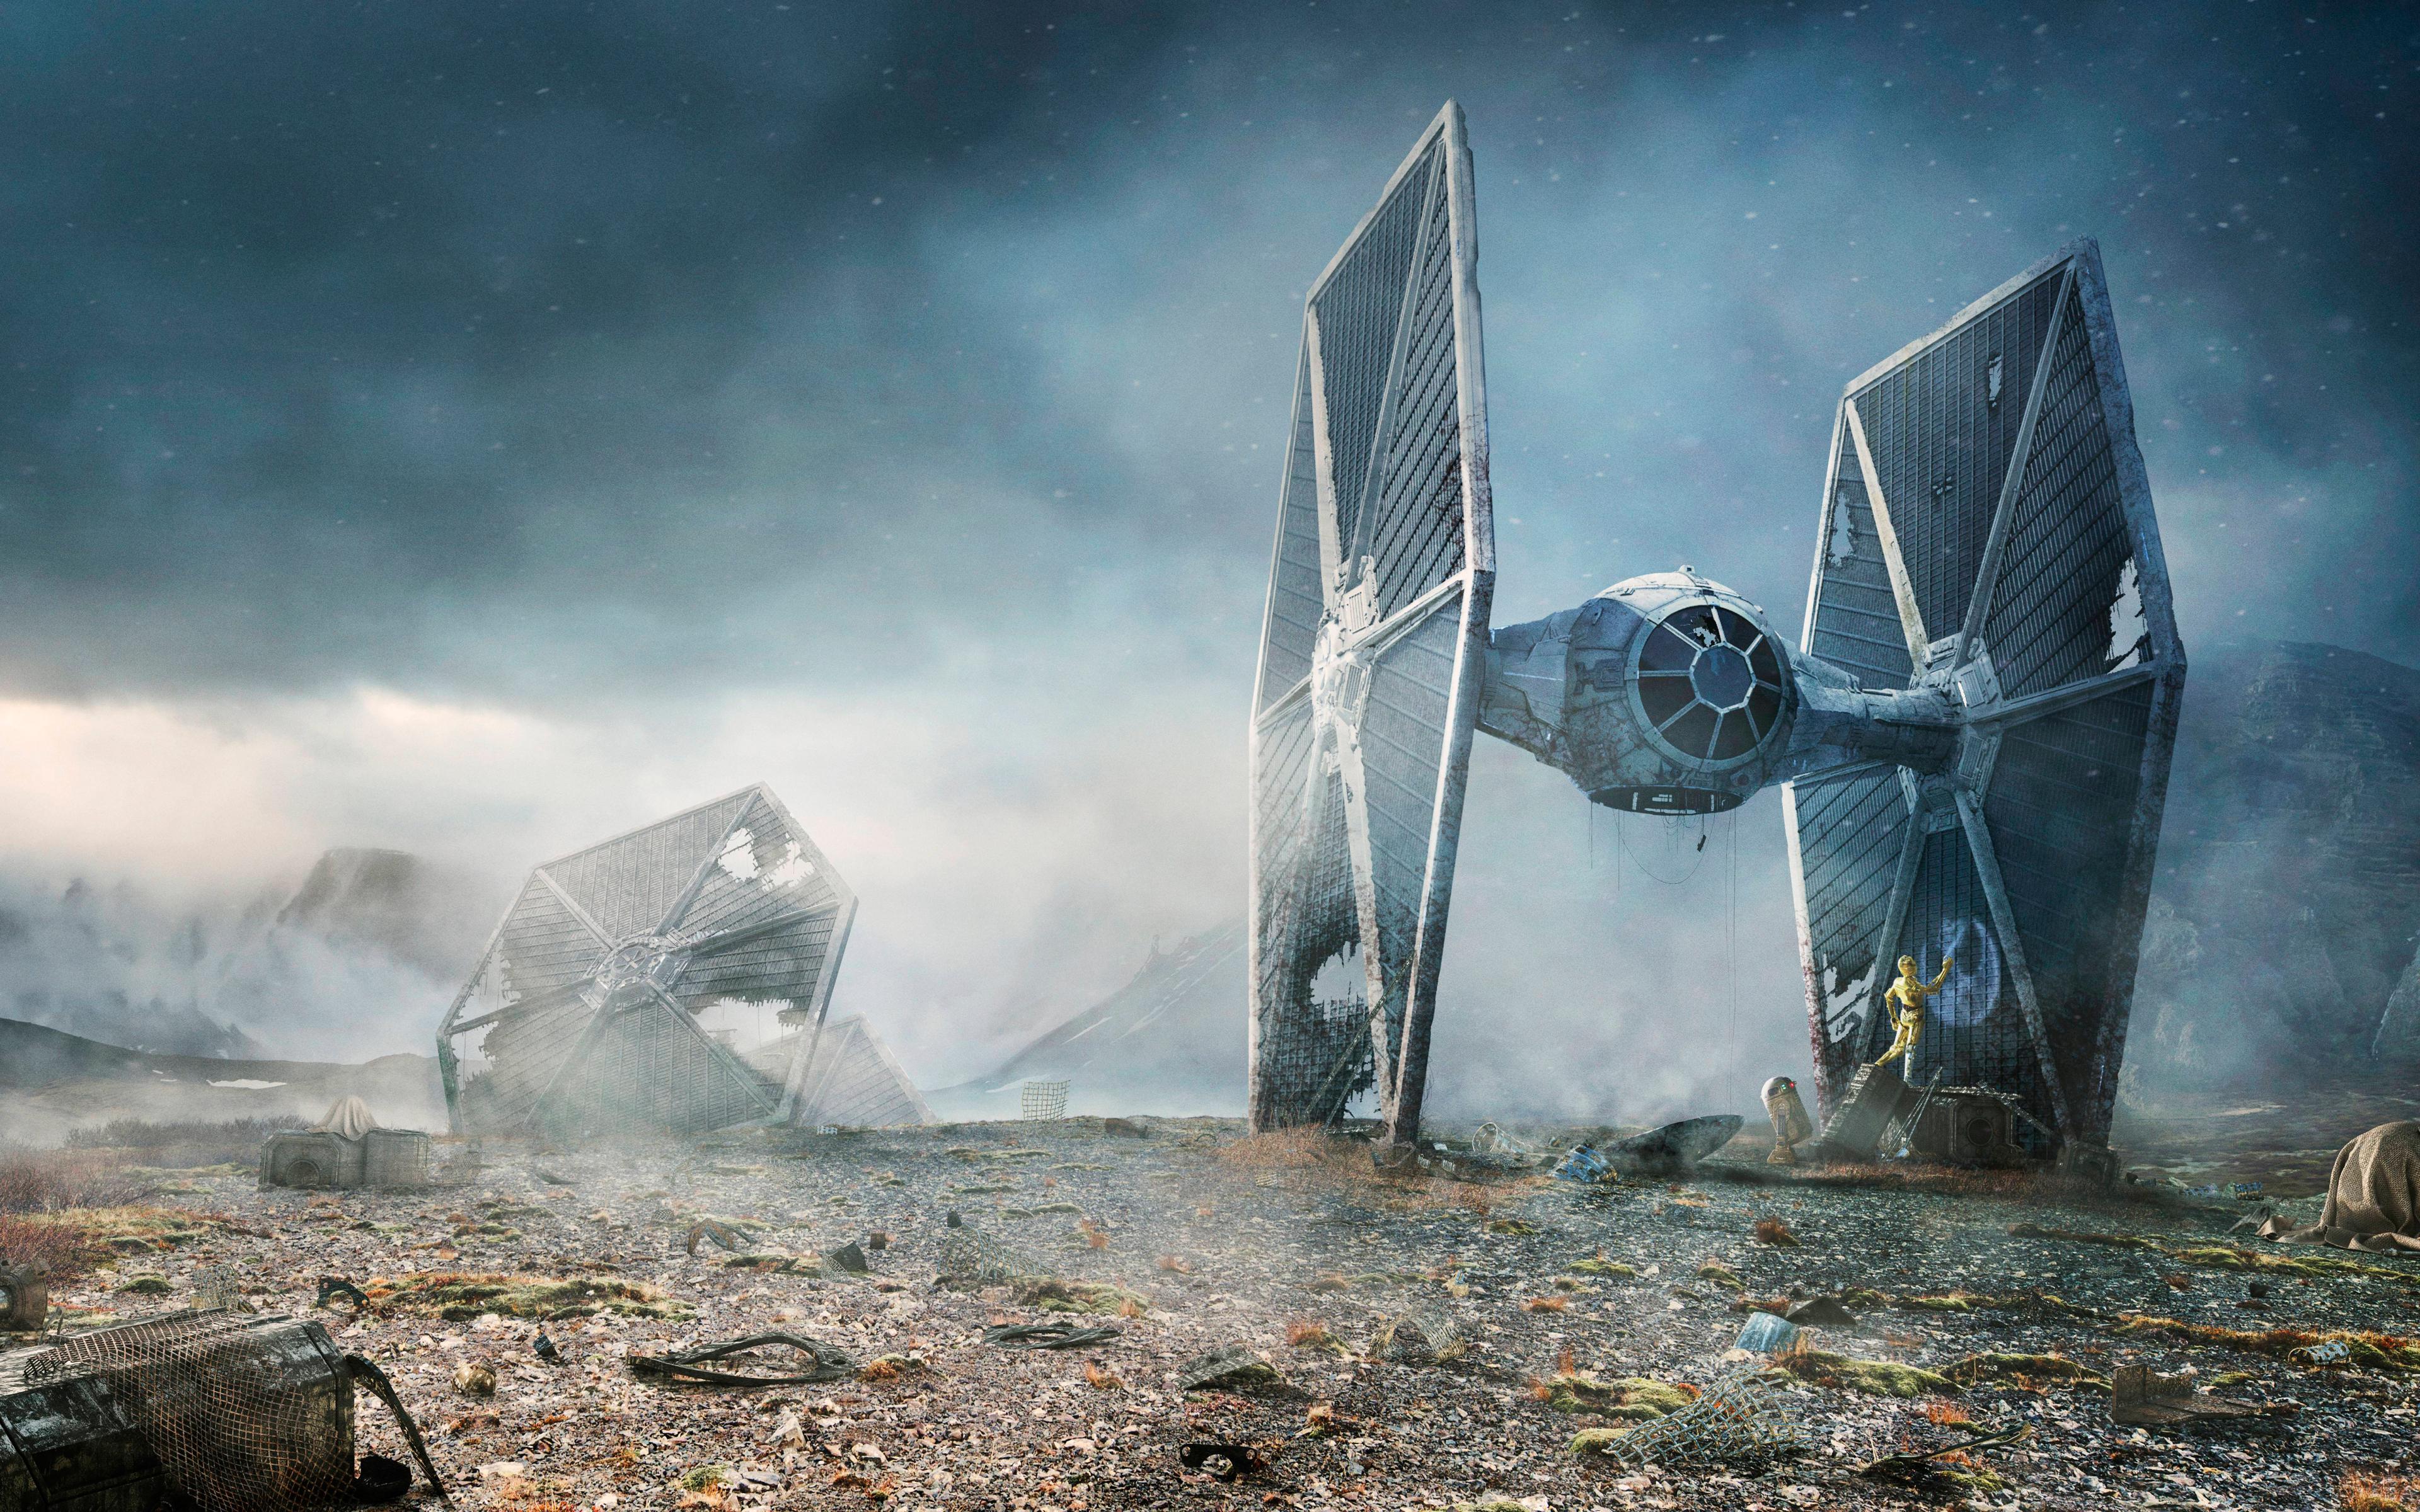 Download Tie Fighter Star Wars 240x400 Resolution HD 8K Wallpaper